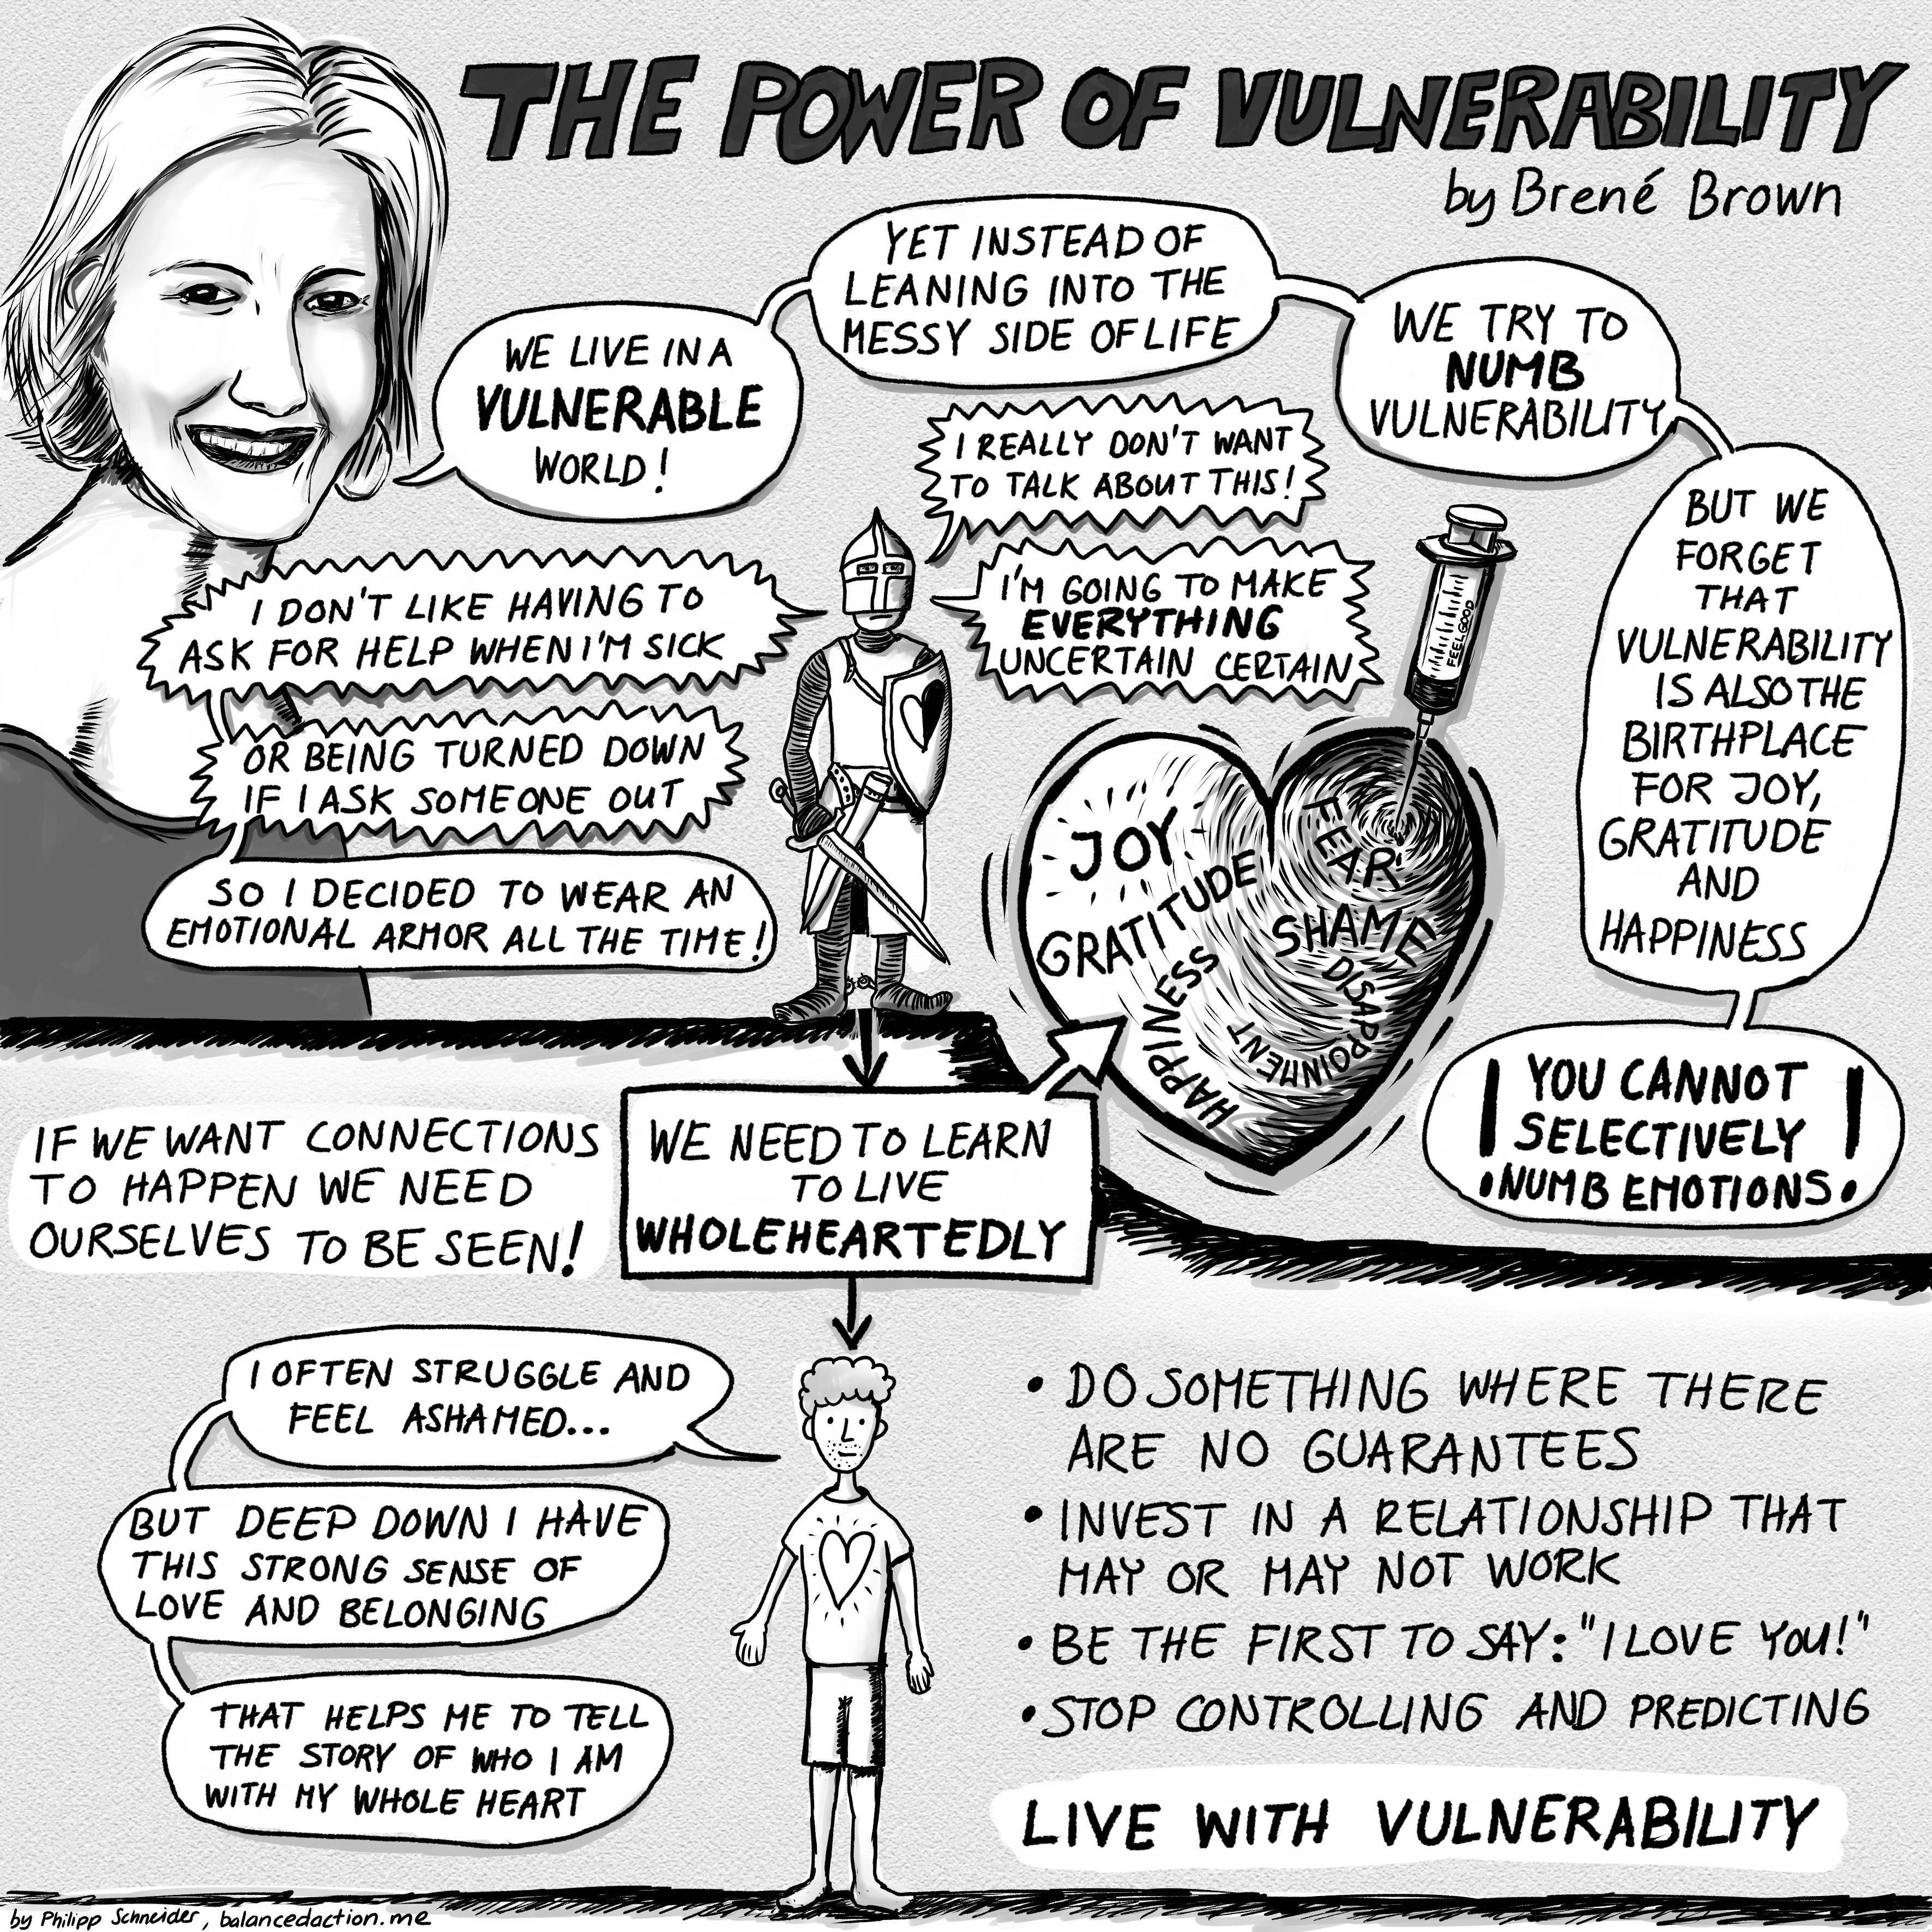 Sketchnote: Brené Brown on the power of vulnerability